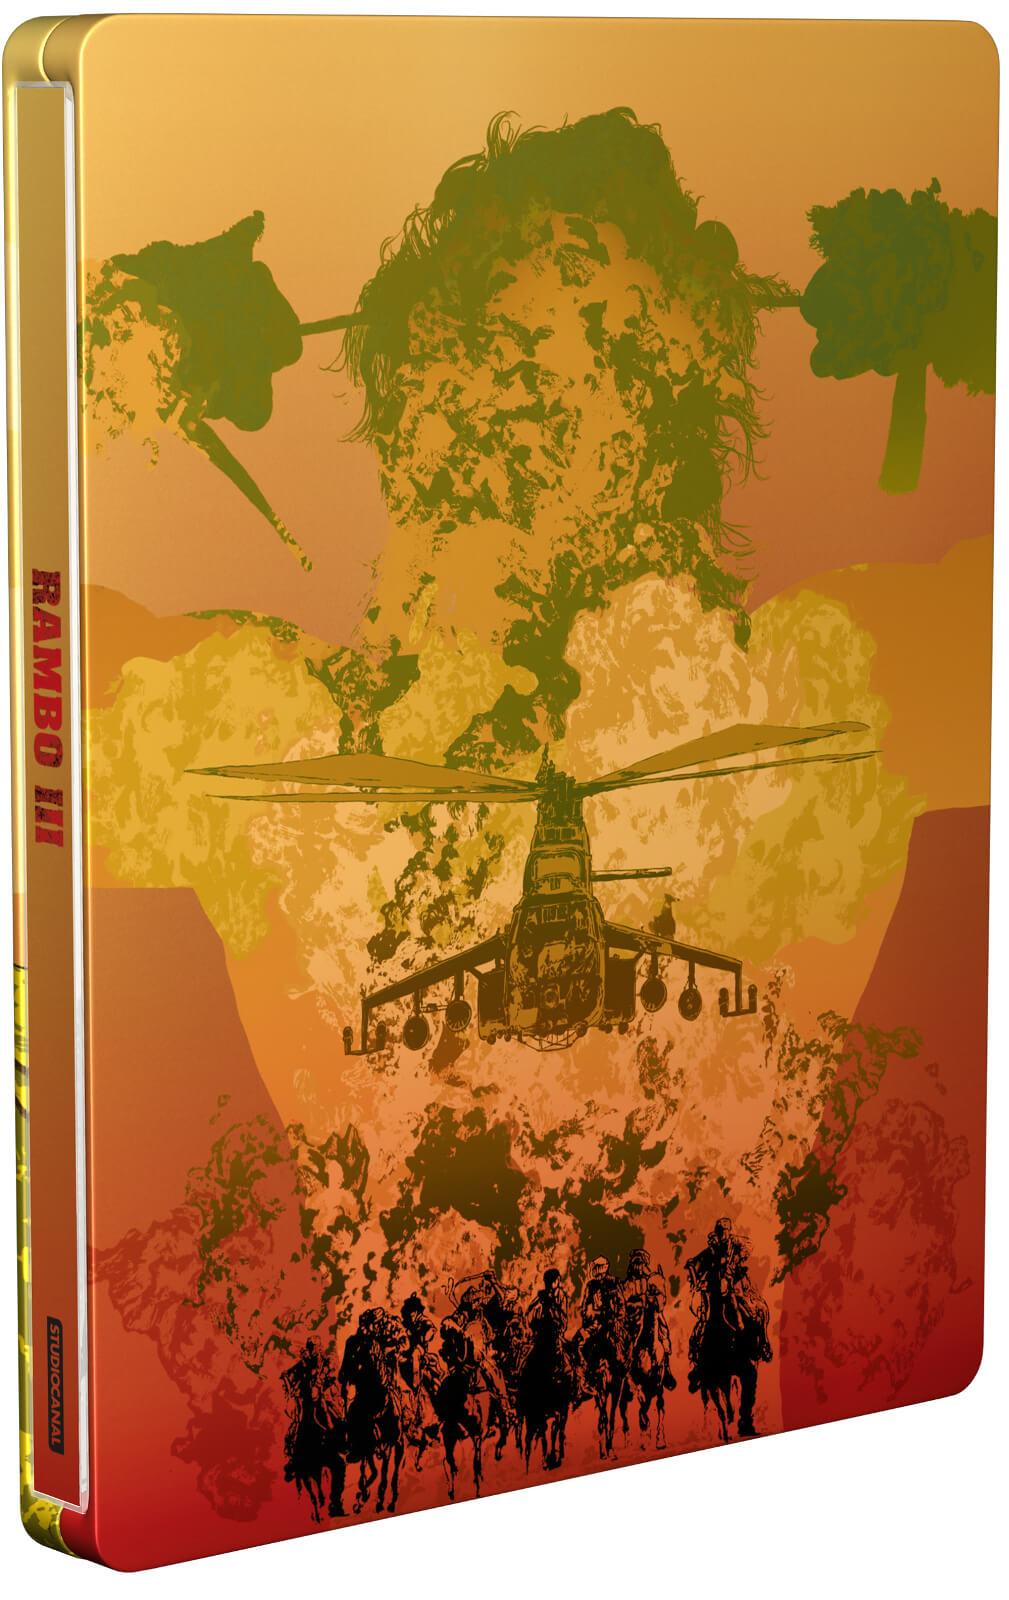 Rambo 3 (4K Blu-ray + Blu-ray) inkl. Steelbook für 13,85€ inkl. Versand (Zavvi UK)